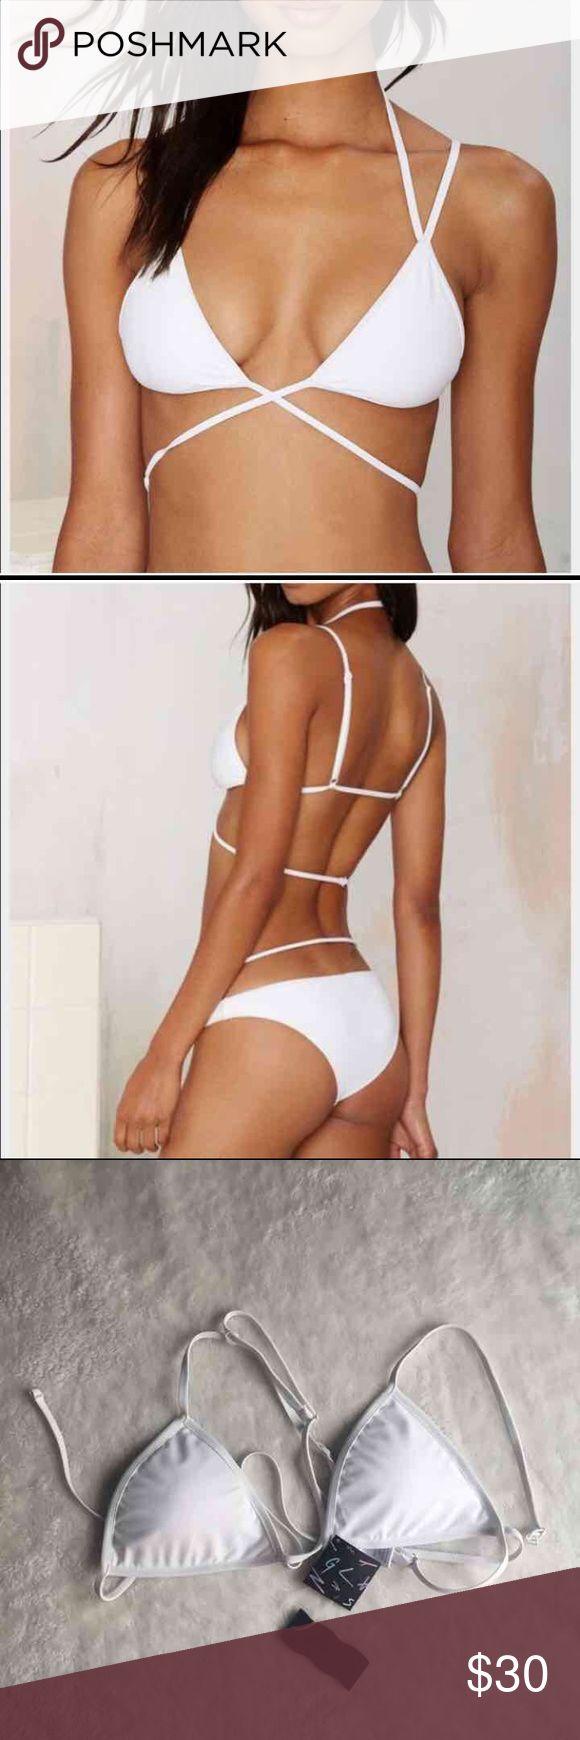 NWT Nast Gal Sugarhill Bikini top NWT cute and trendy white bikini top from nasty gal Nasty Gal Swim Bikinis